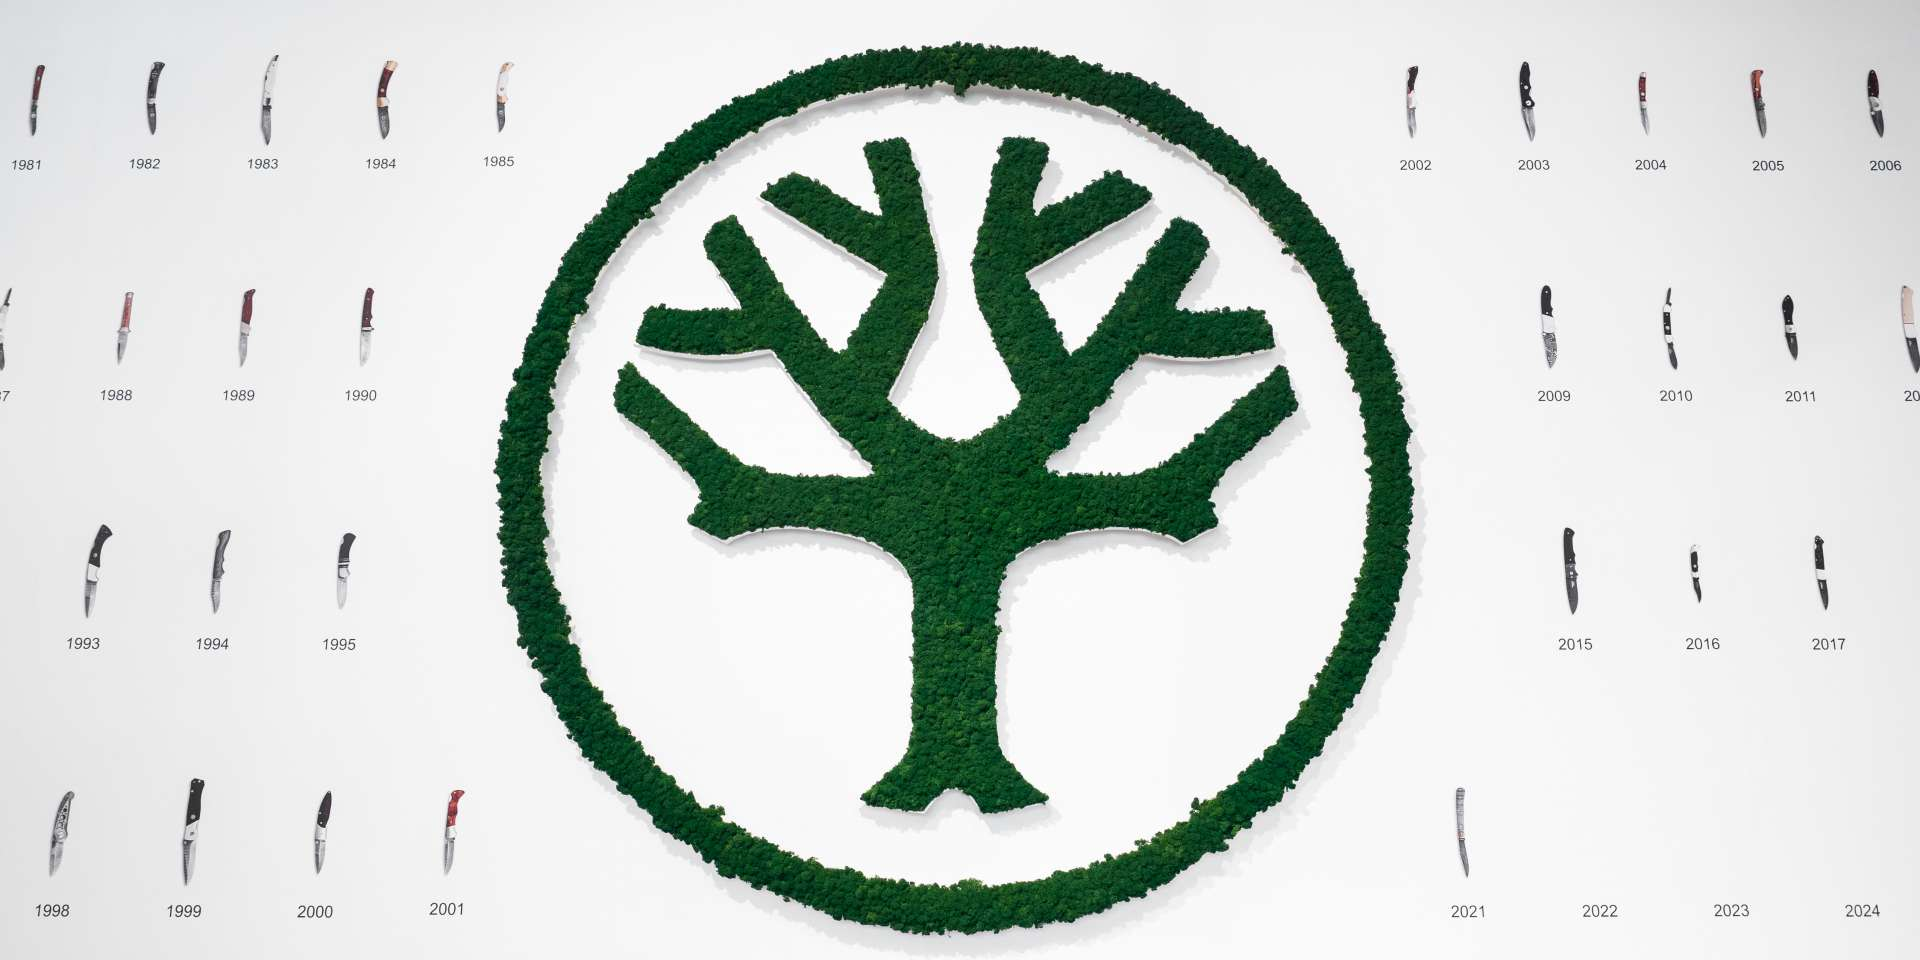 Mooslogo NATURADOR: Logo konturgefräster Baum begrünt mit blattgrünem Islandmoos